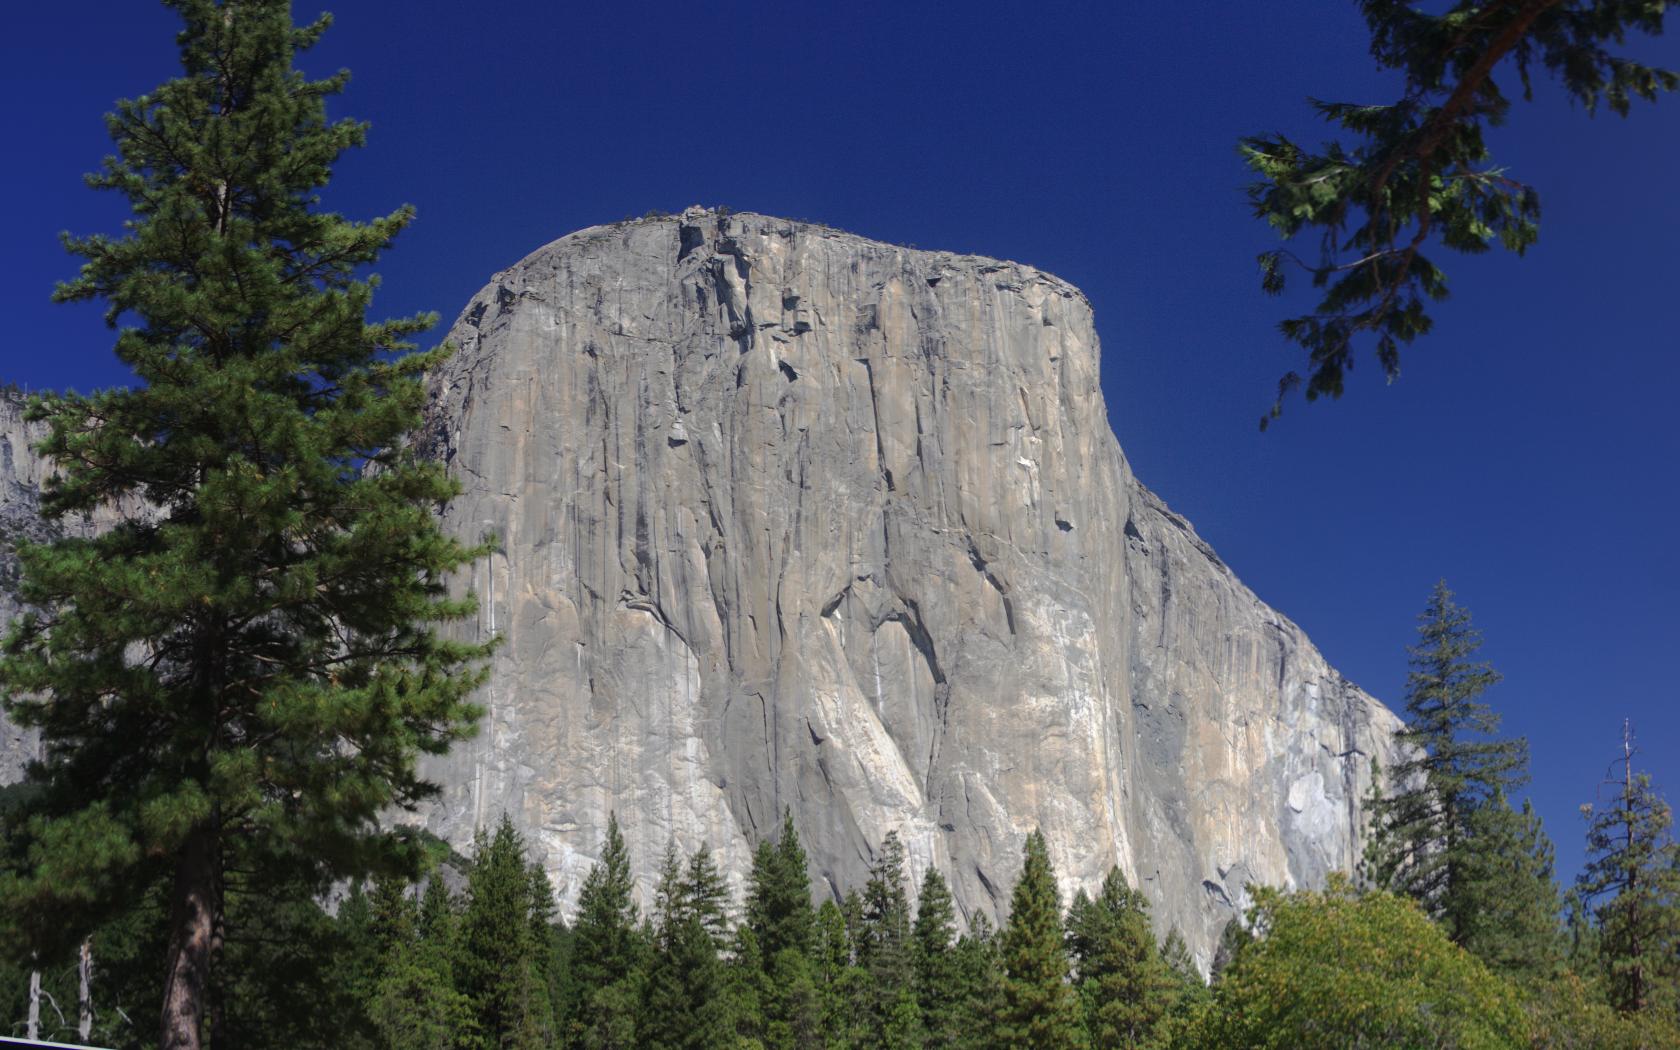 Enjoy this new Yosemite desktop background Landscapes wallpapers 1680x1050